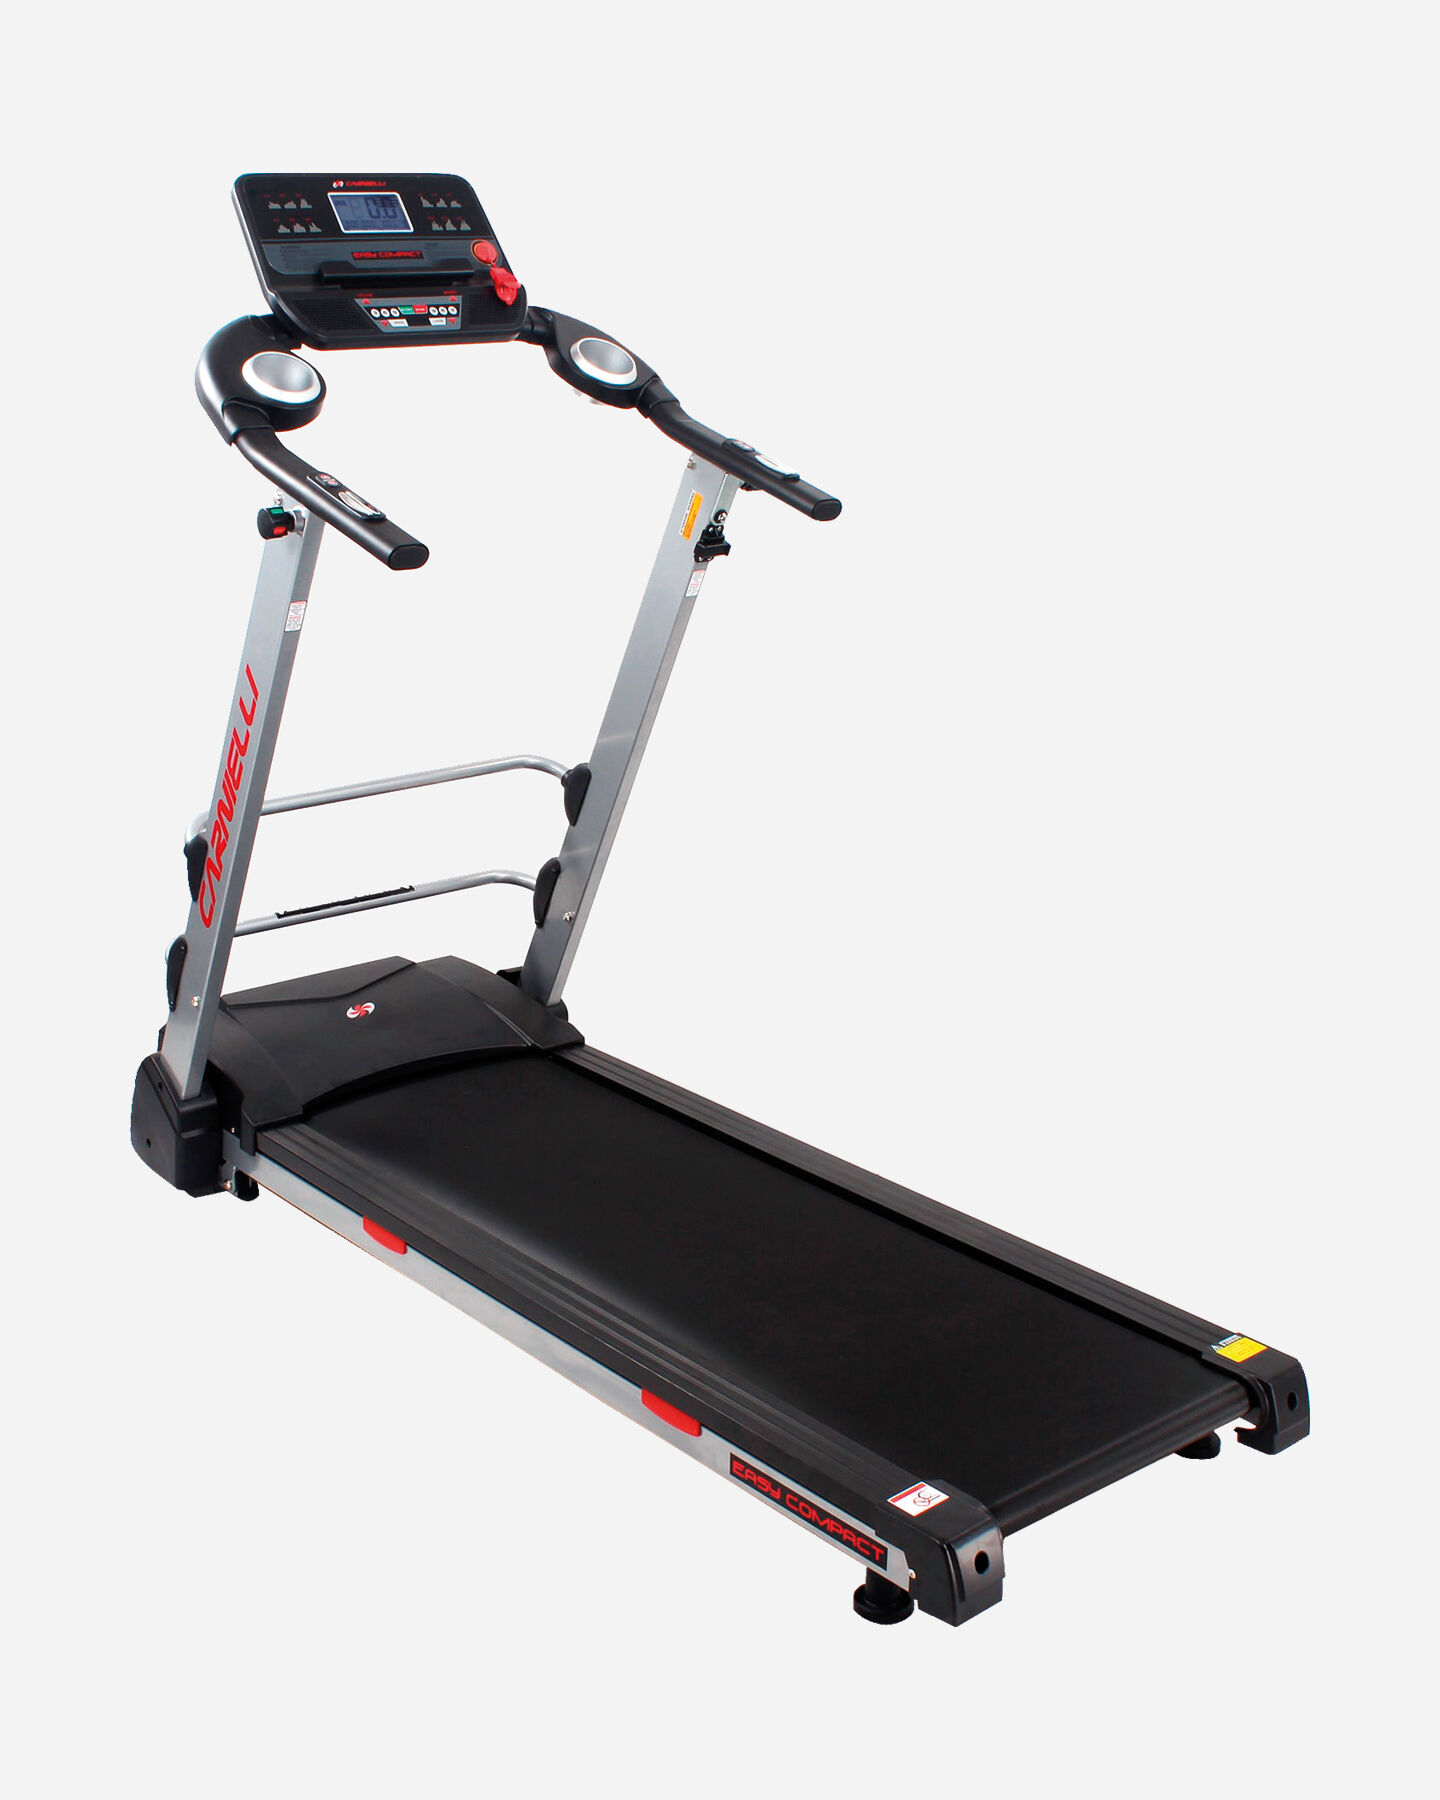 Tapis roulant CARNIELLI EASY COMPACT S4000771 1 UNI scatto 0